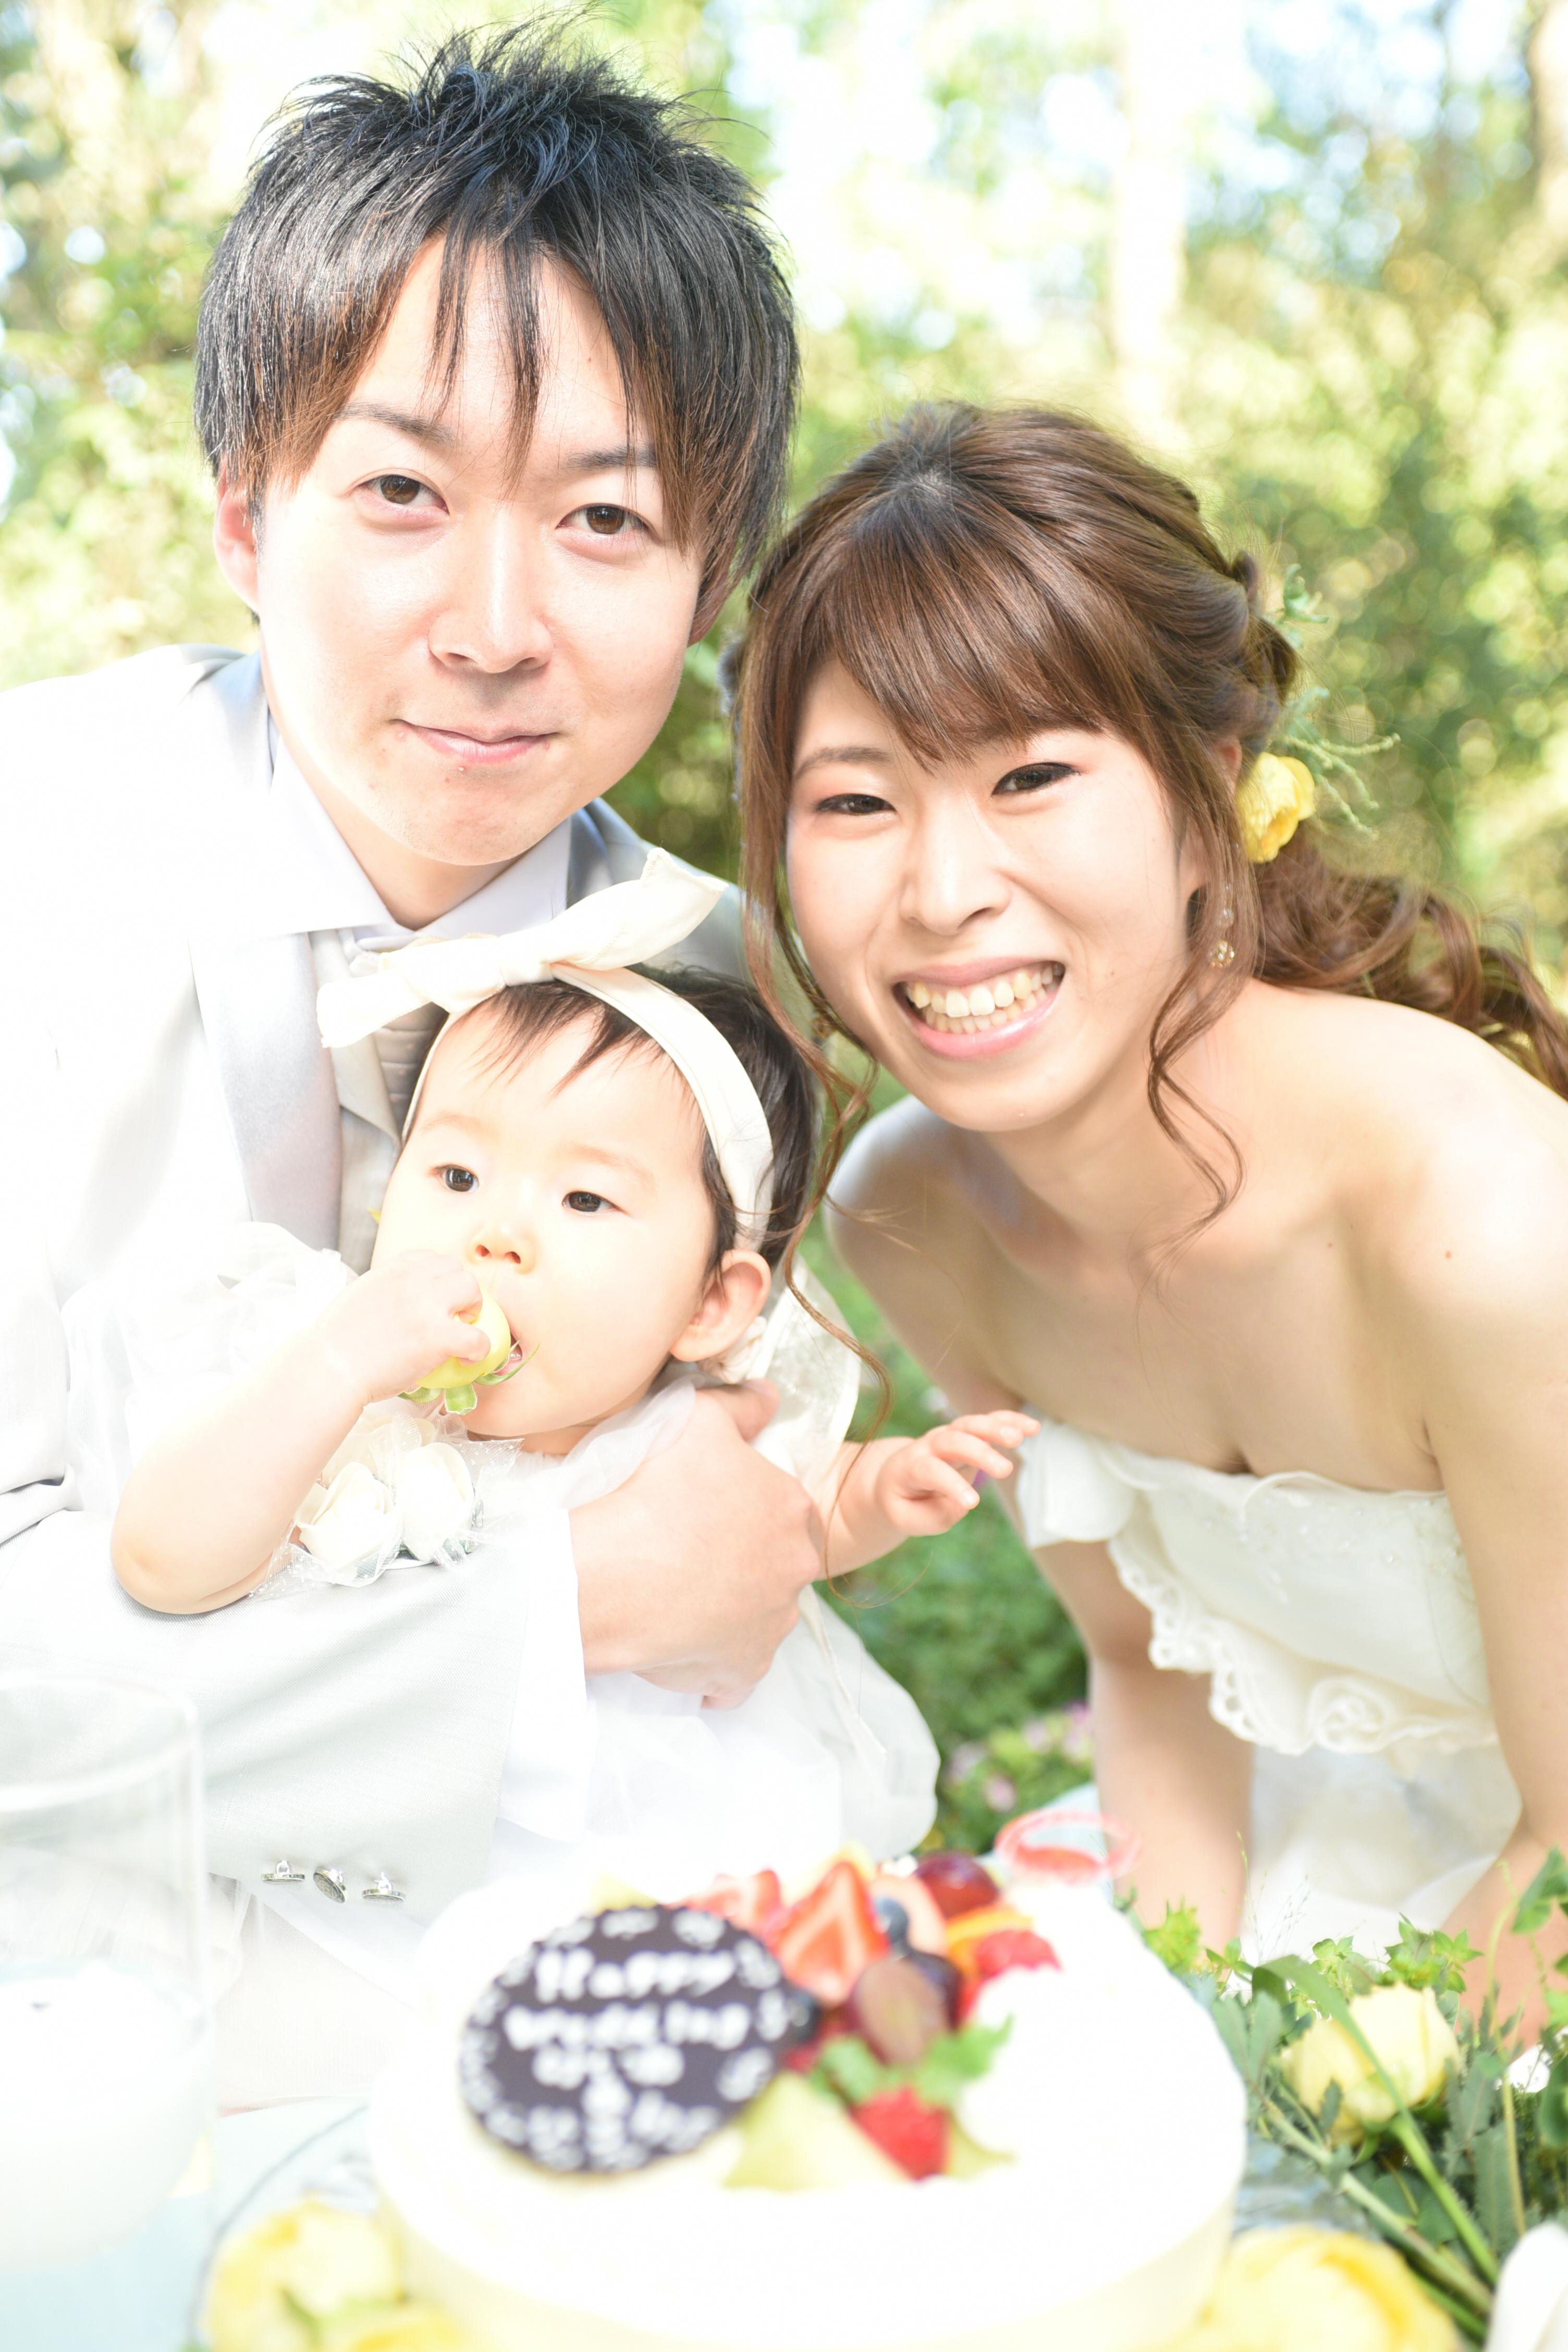 http://www.tgh.co.jp/contents/news/750_2476-99.jpg